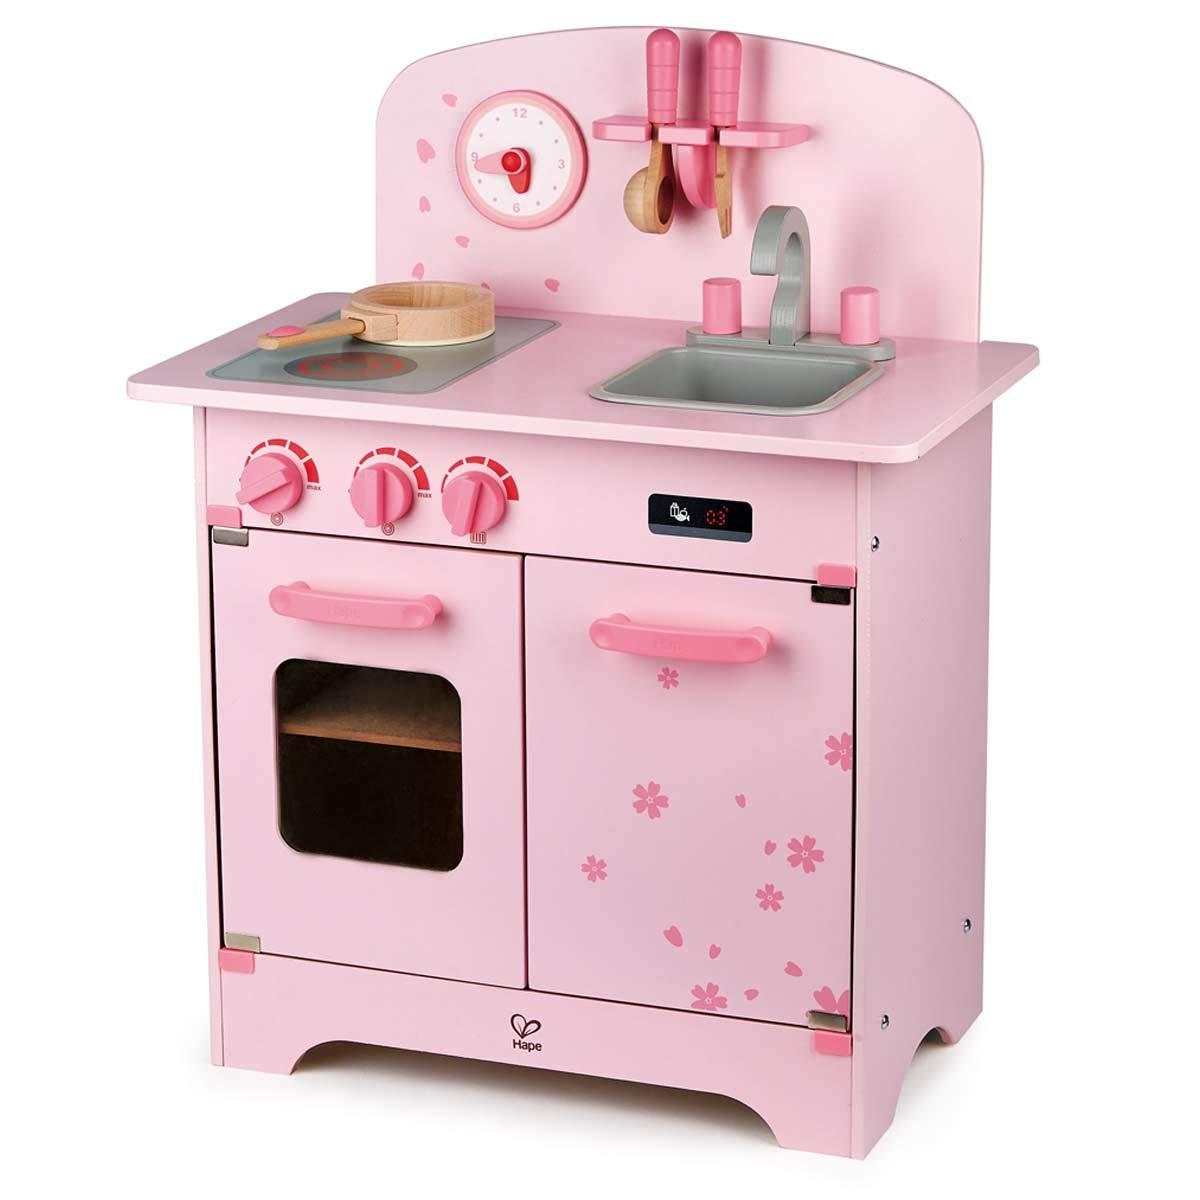 Hape Kinderküche - Hape Spielküche Kirschblüte